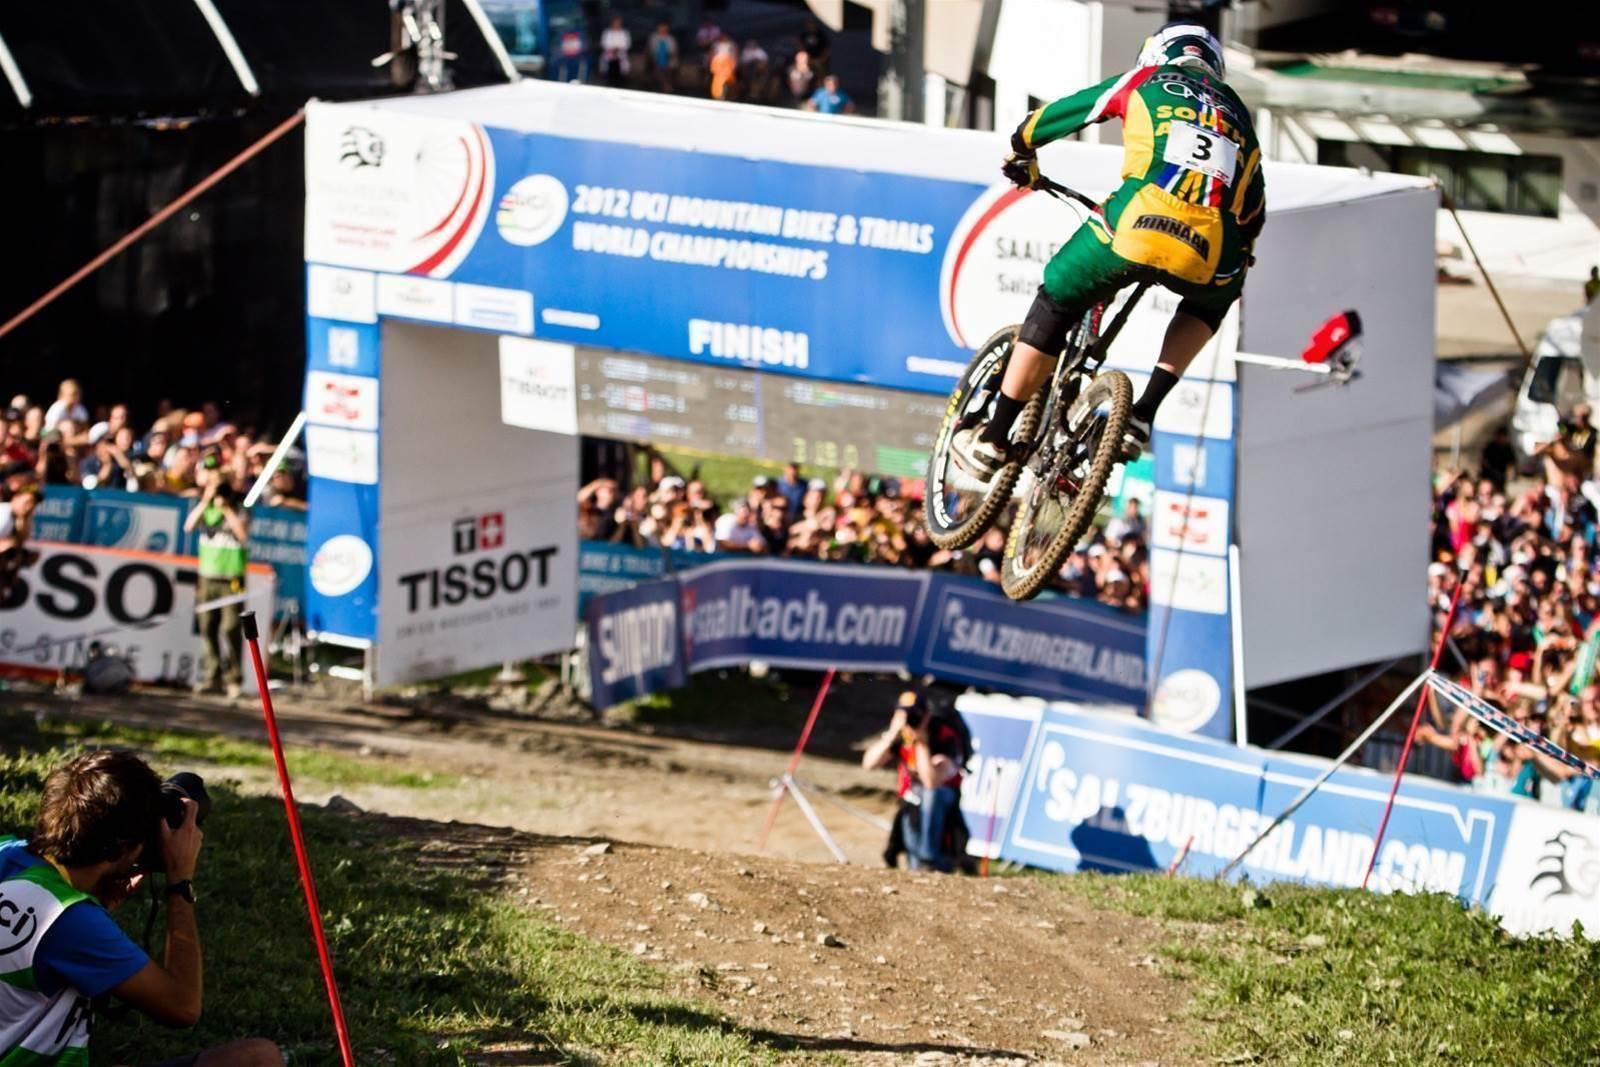 2020 Downhill World Championships head to Saalfelden Leogang